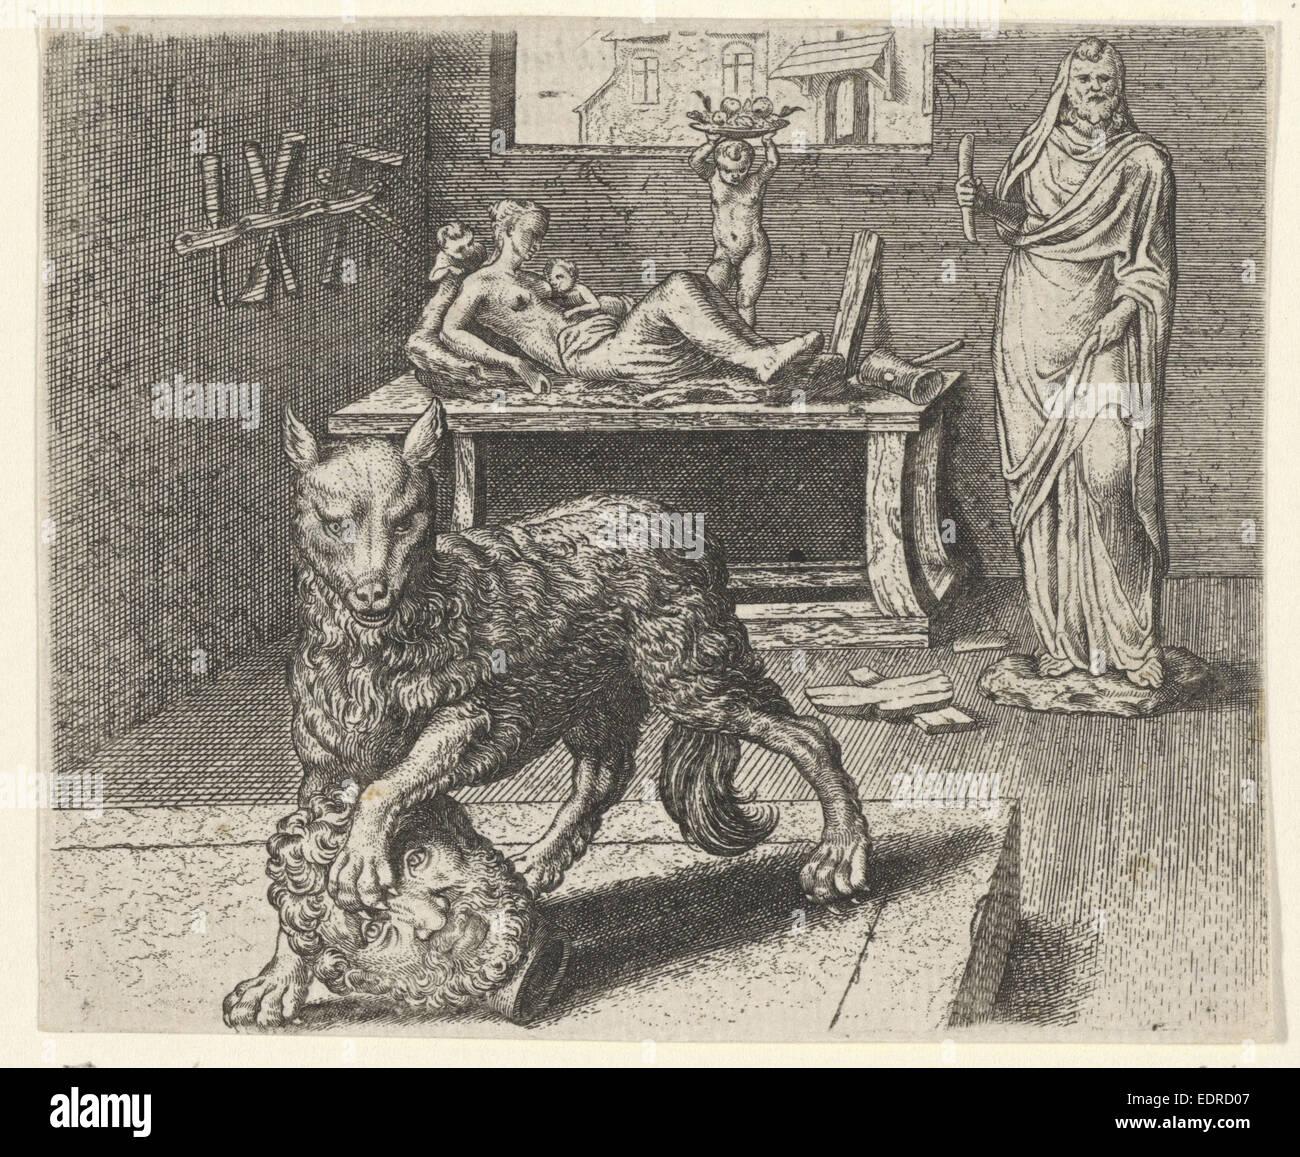 Fable of Wolf and statue, Aegidius Sadeler, Marcus Gheeraerts (I) - Stock Image